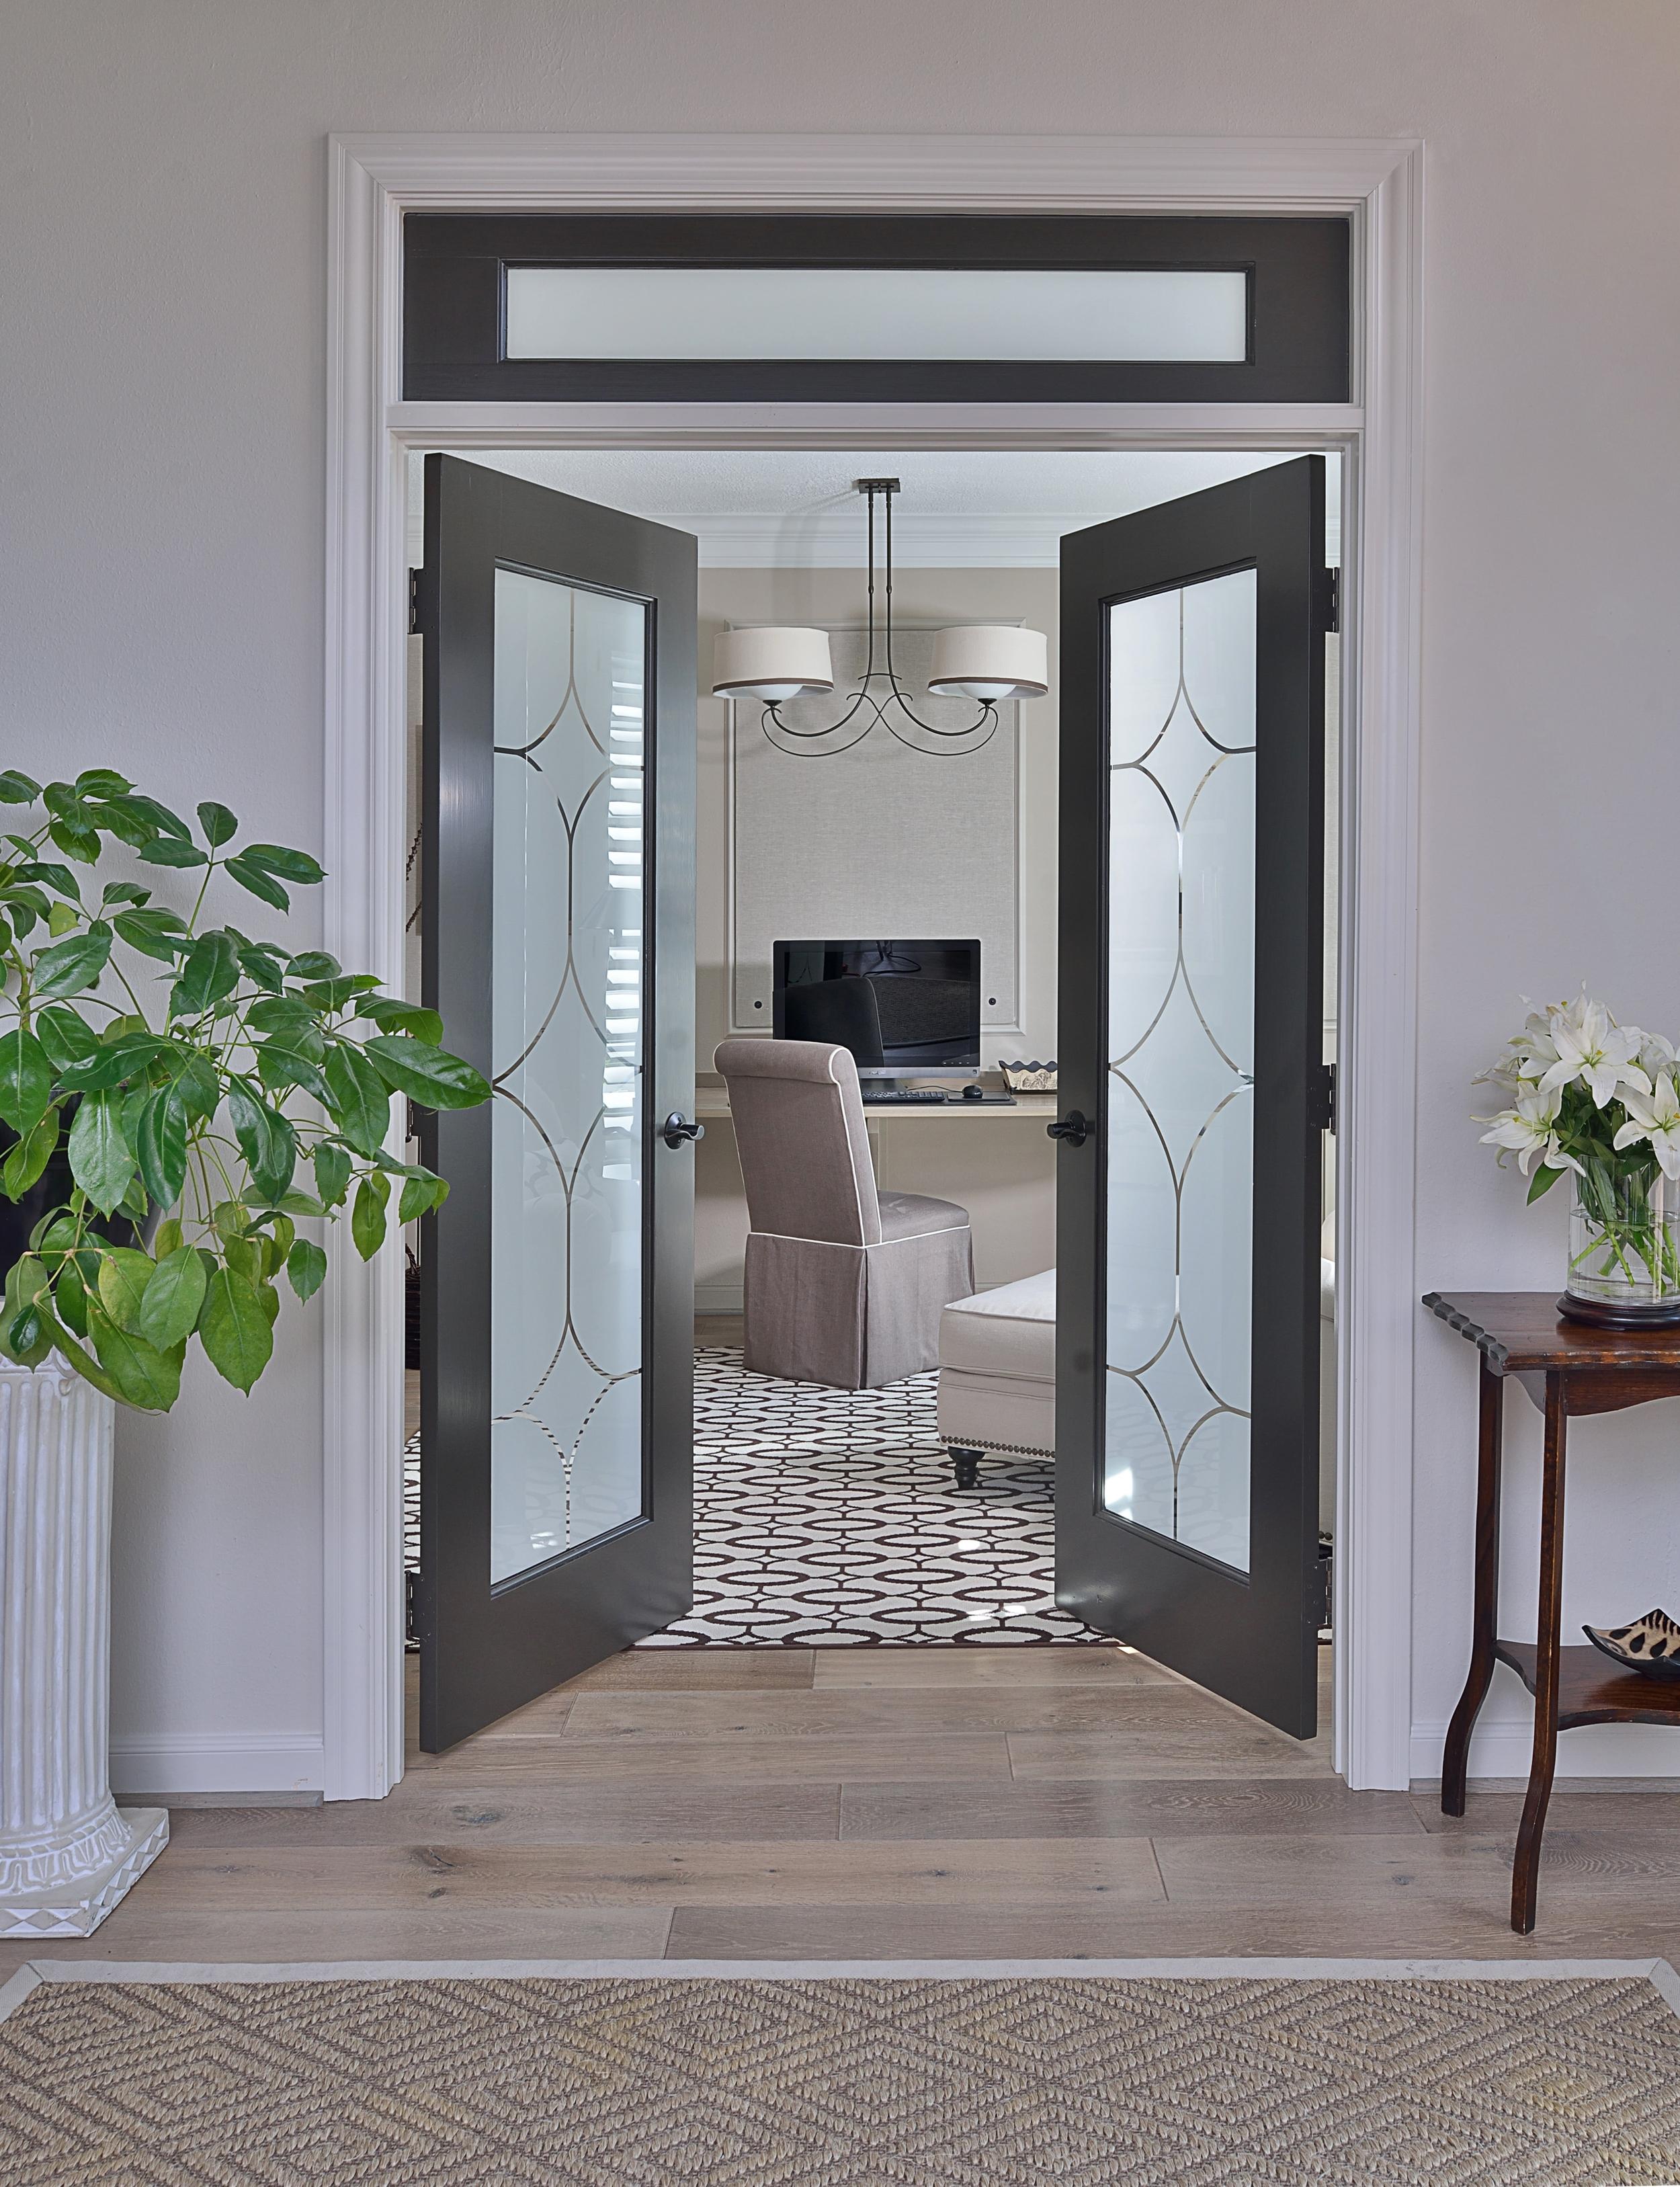 Home Office, Designer: Carla Aston